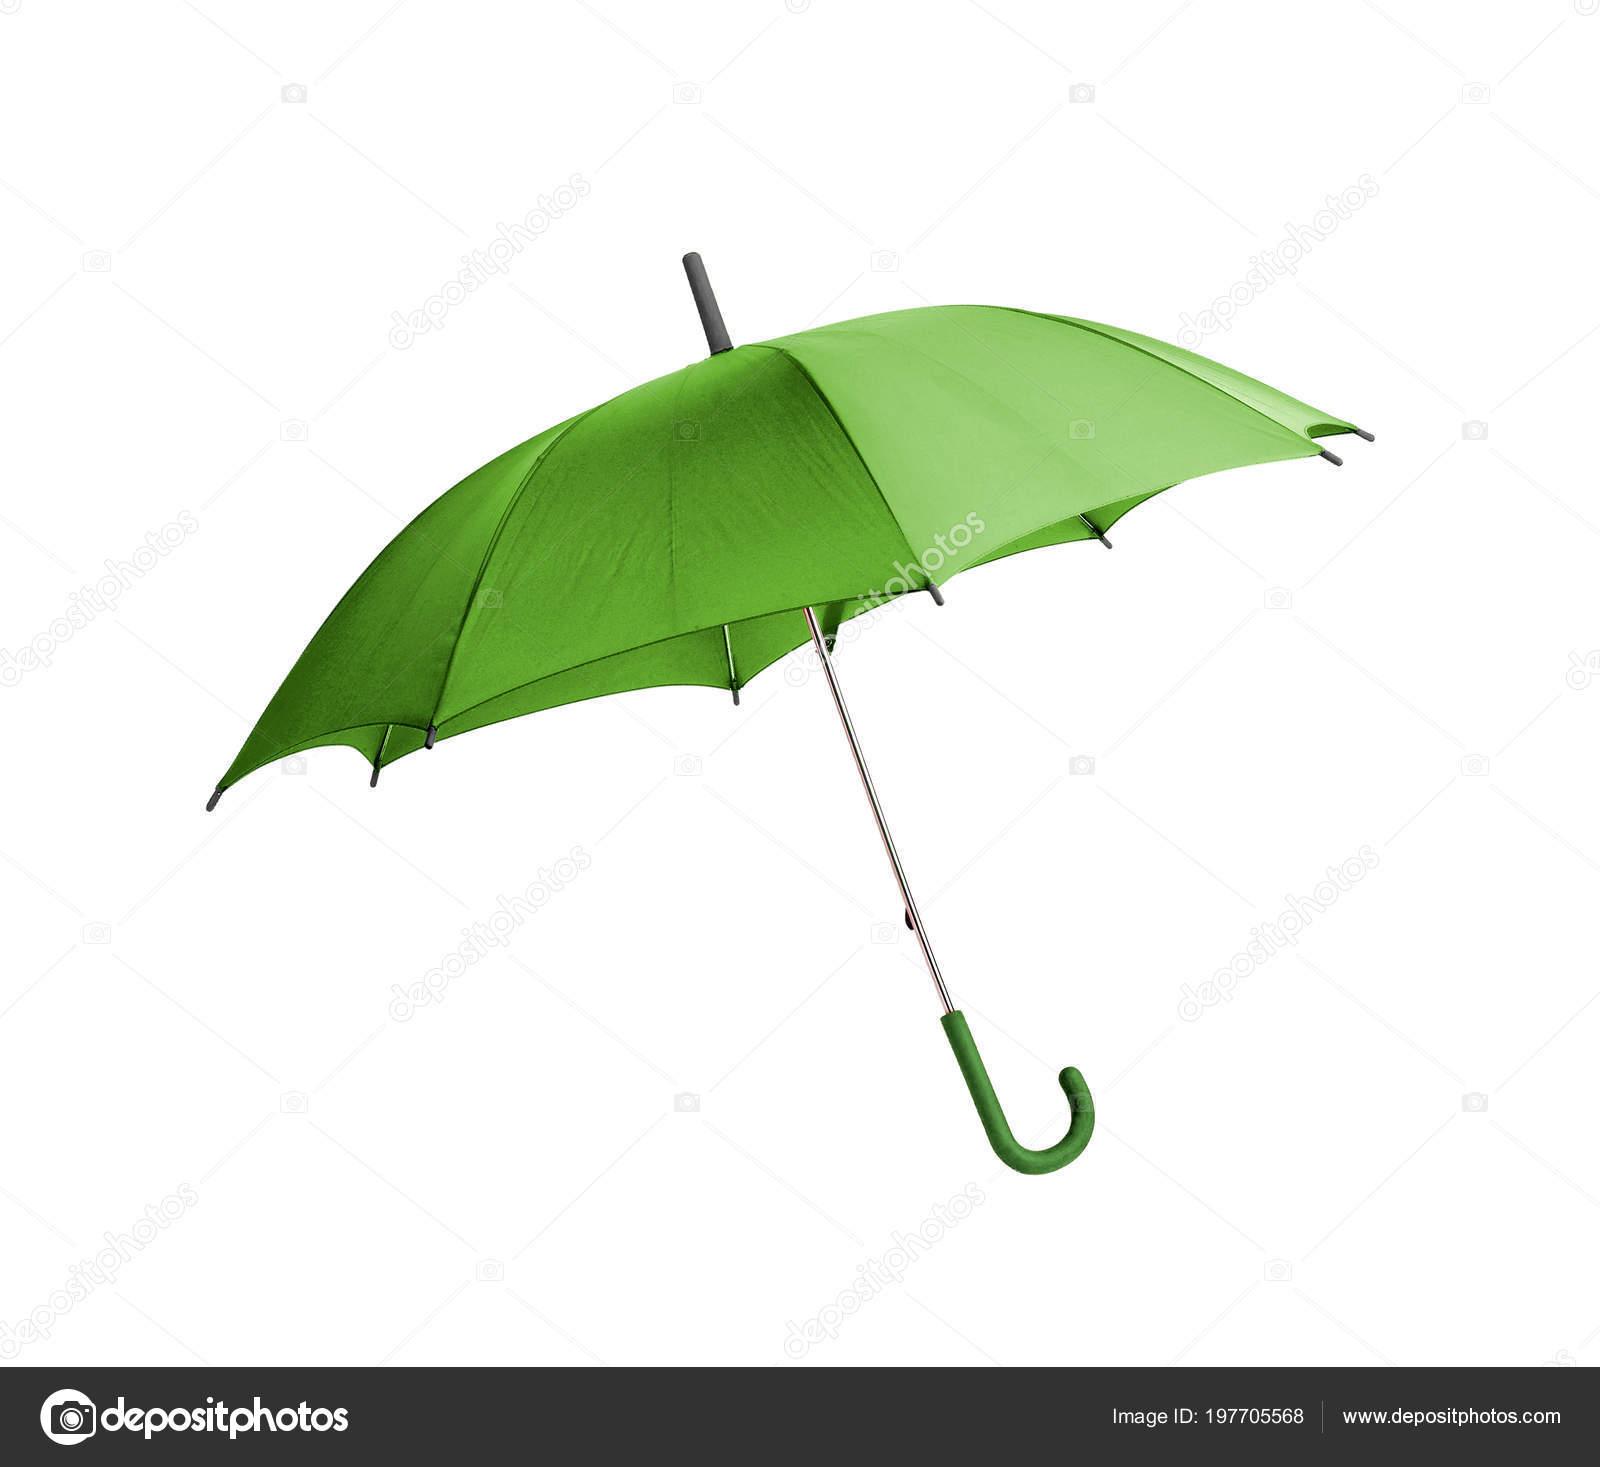 Tienda online amplia gama niño Paraguas Verde Aislado Sobre Fondo Blanco — Foto de stock ...